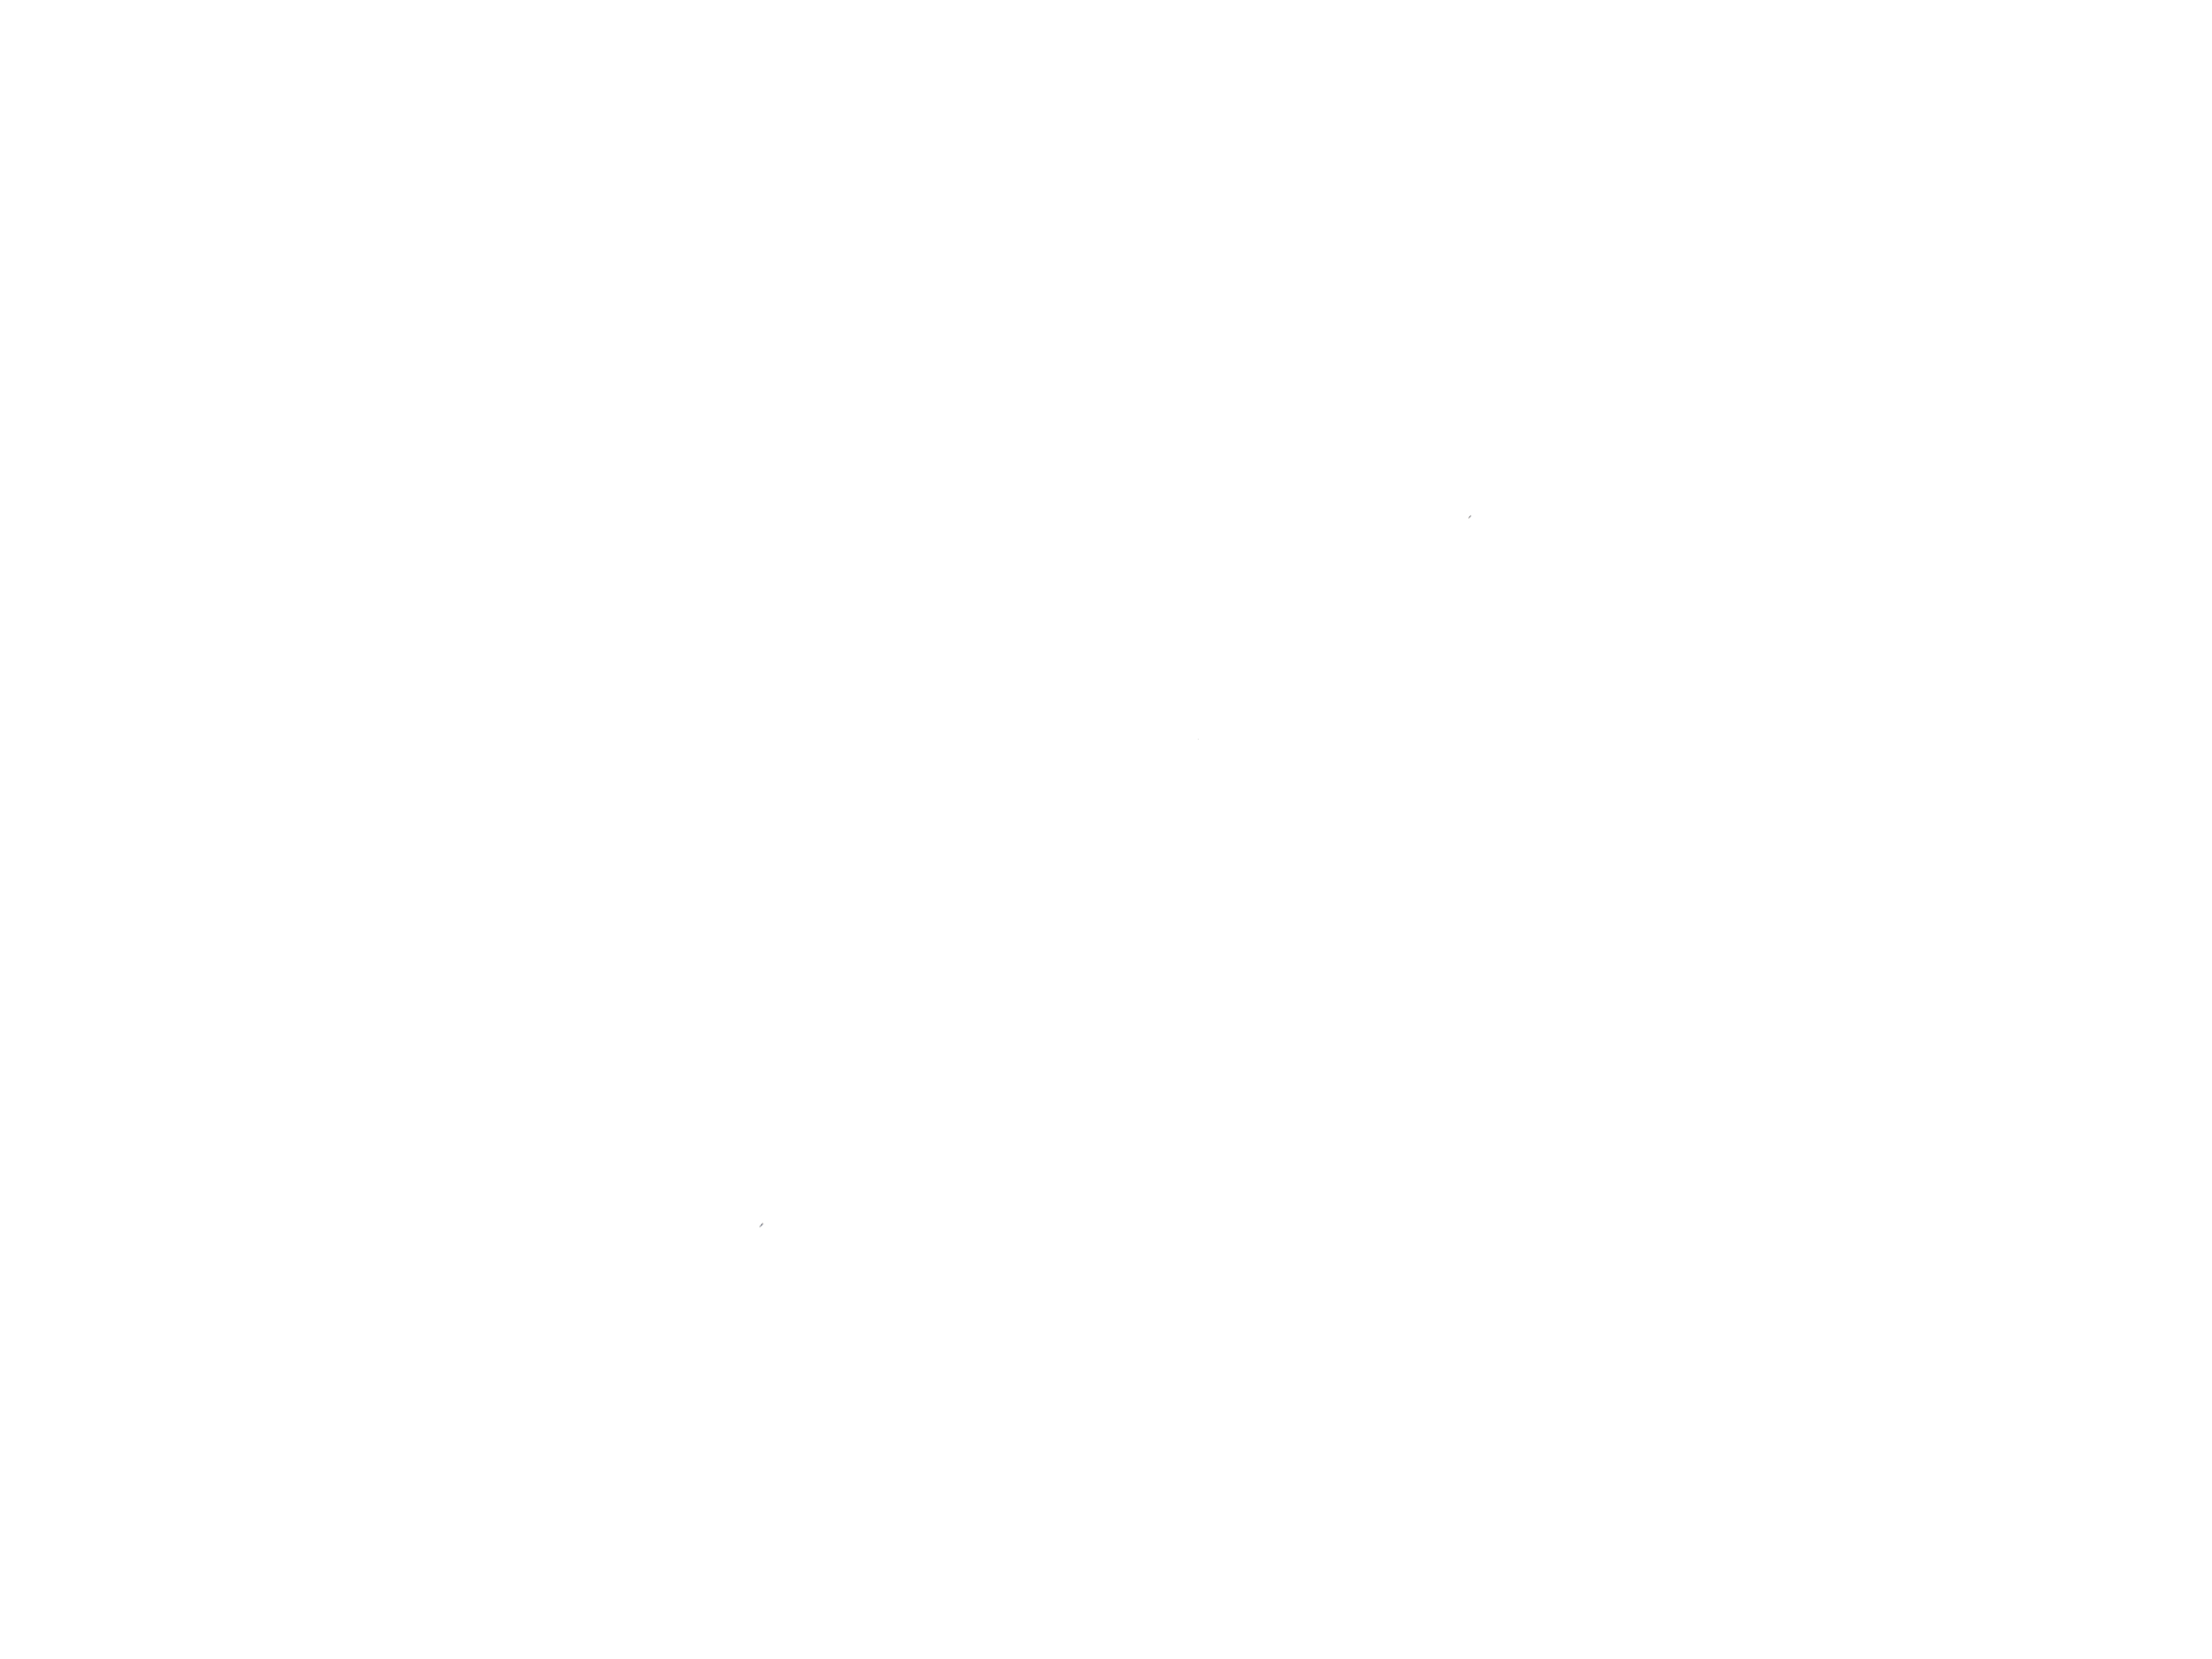 Hafnor/Erichsen